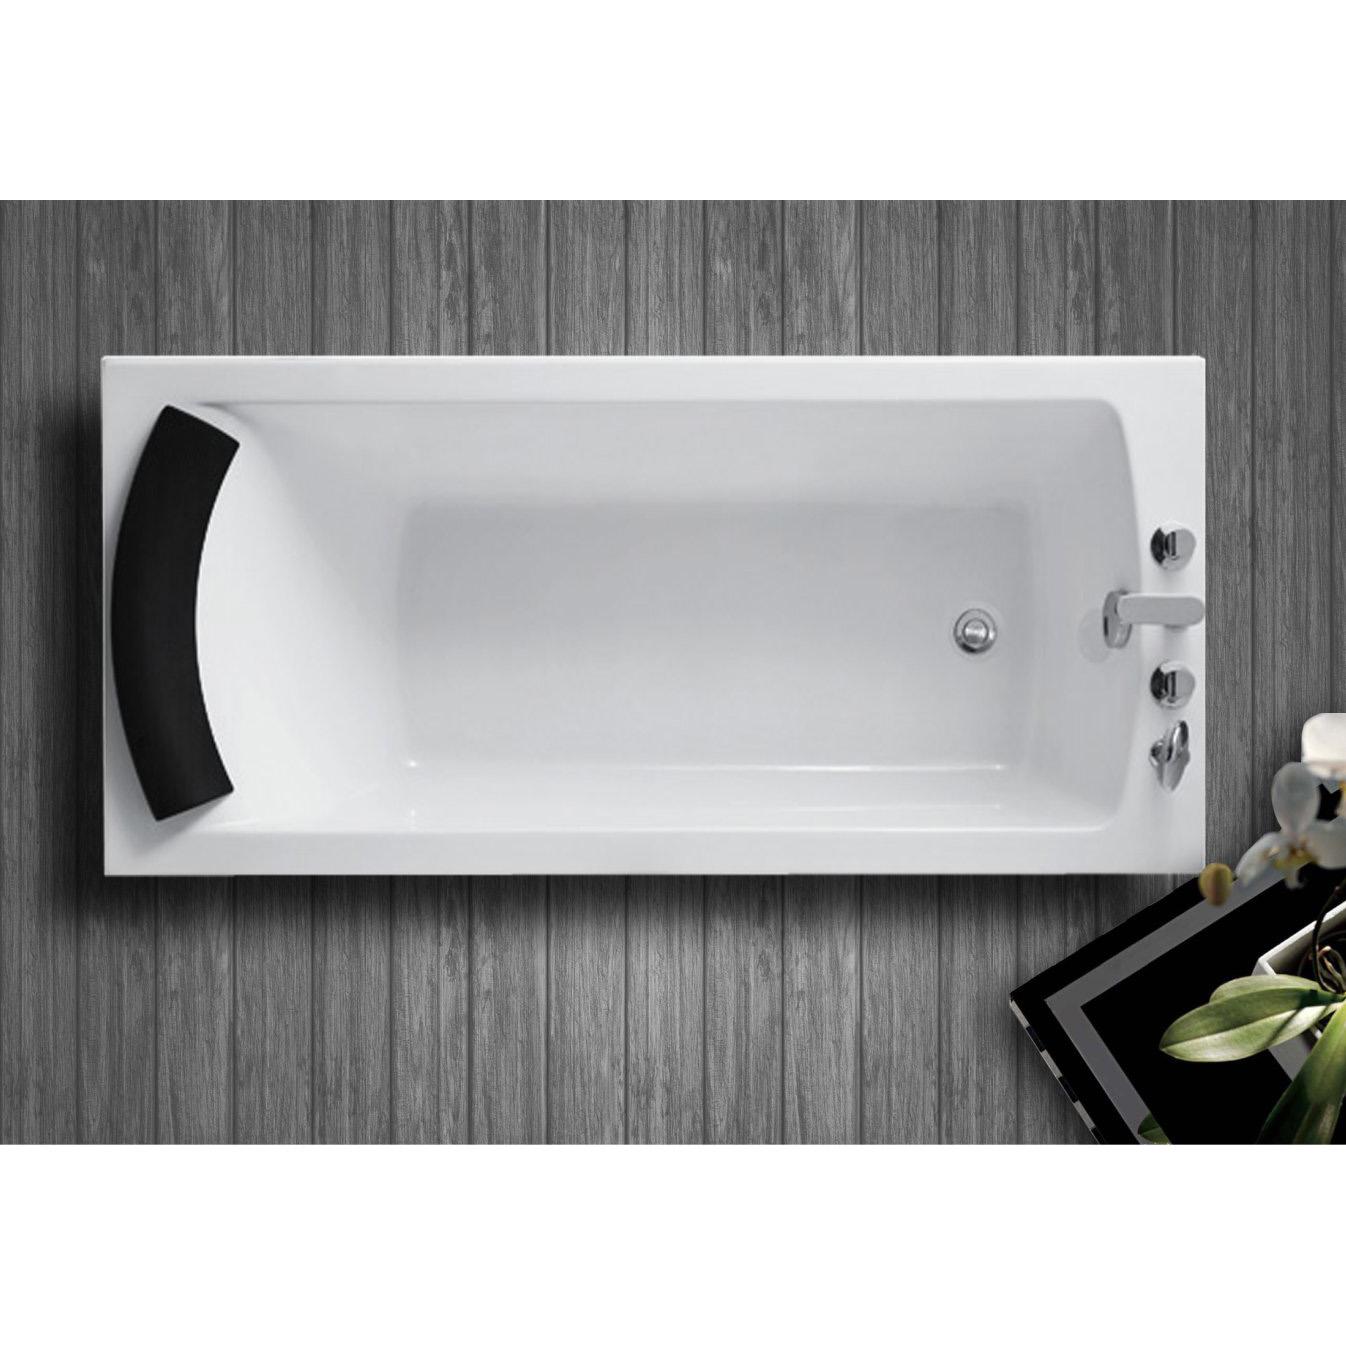 Акриловая ванна Royal bath Vienna RB953201 150х70 каркас сварной к ванне royal bath vienna 150 rb953201k